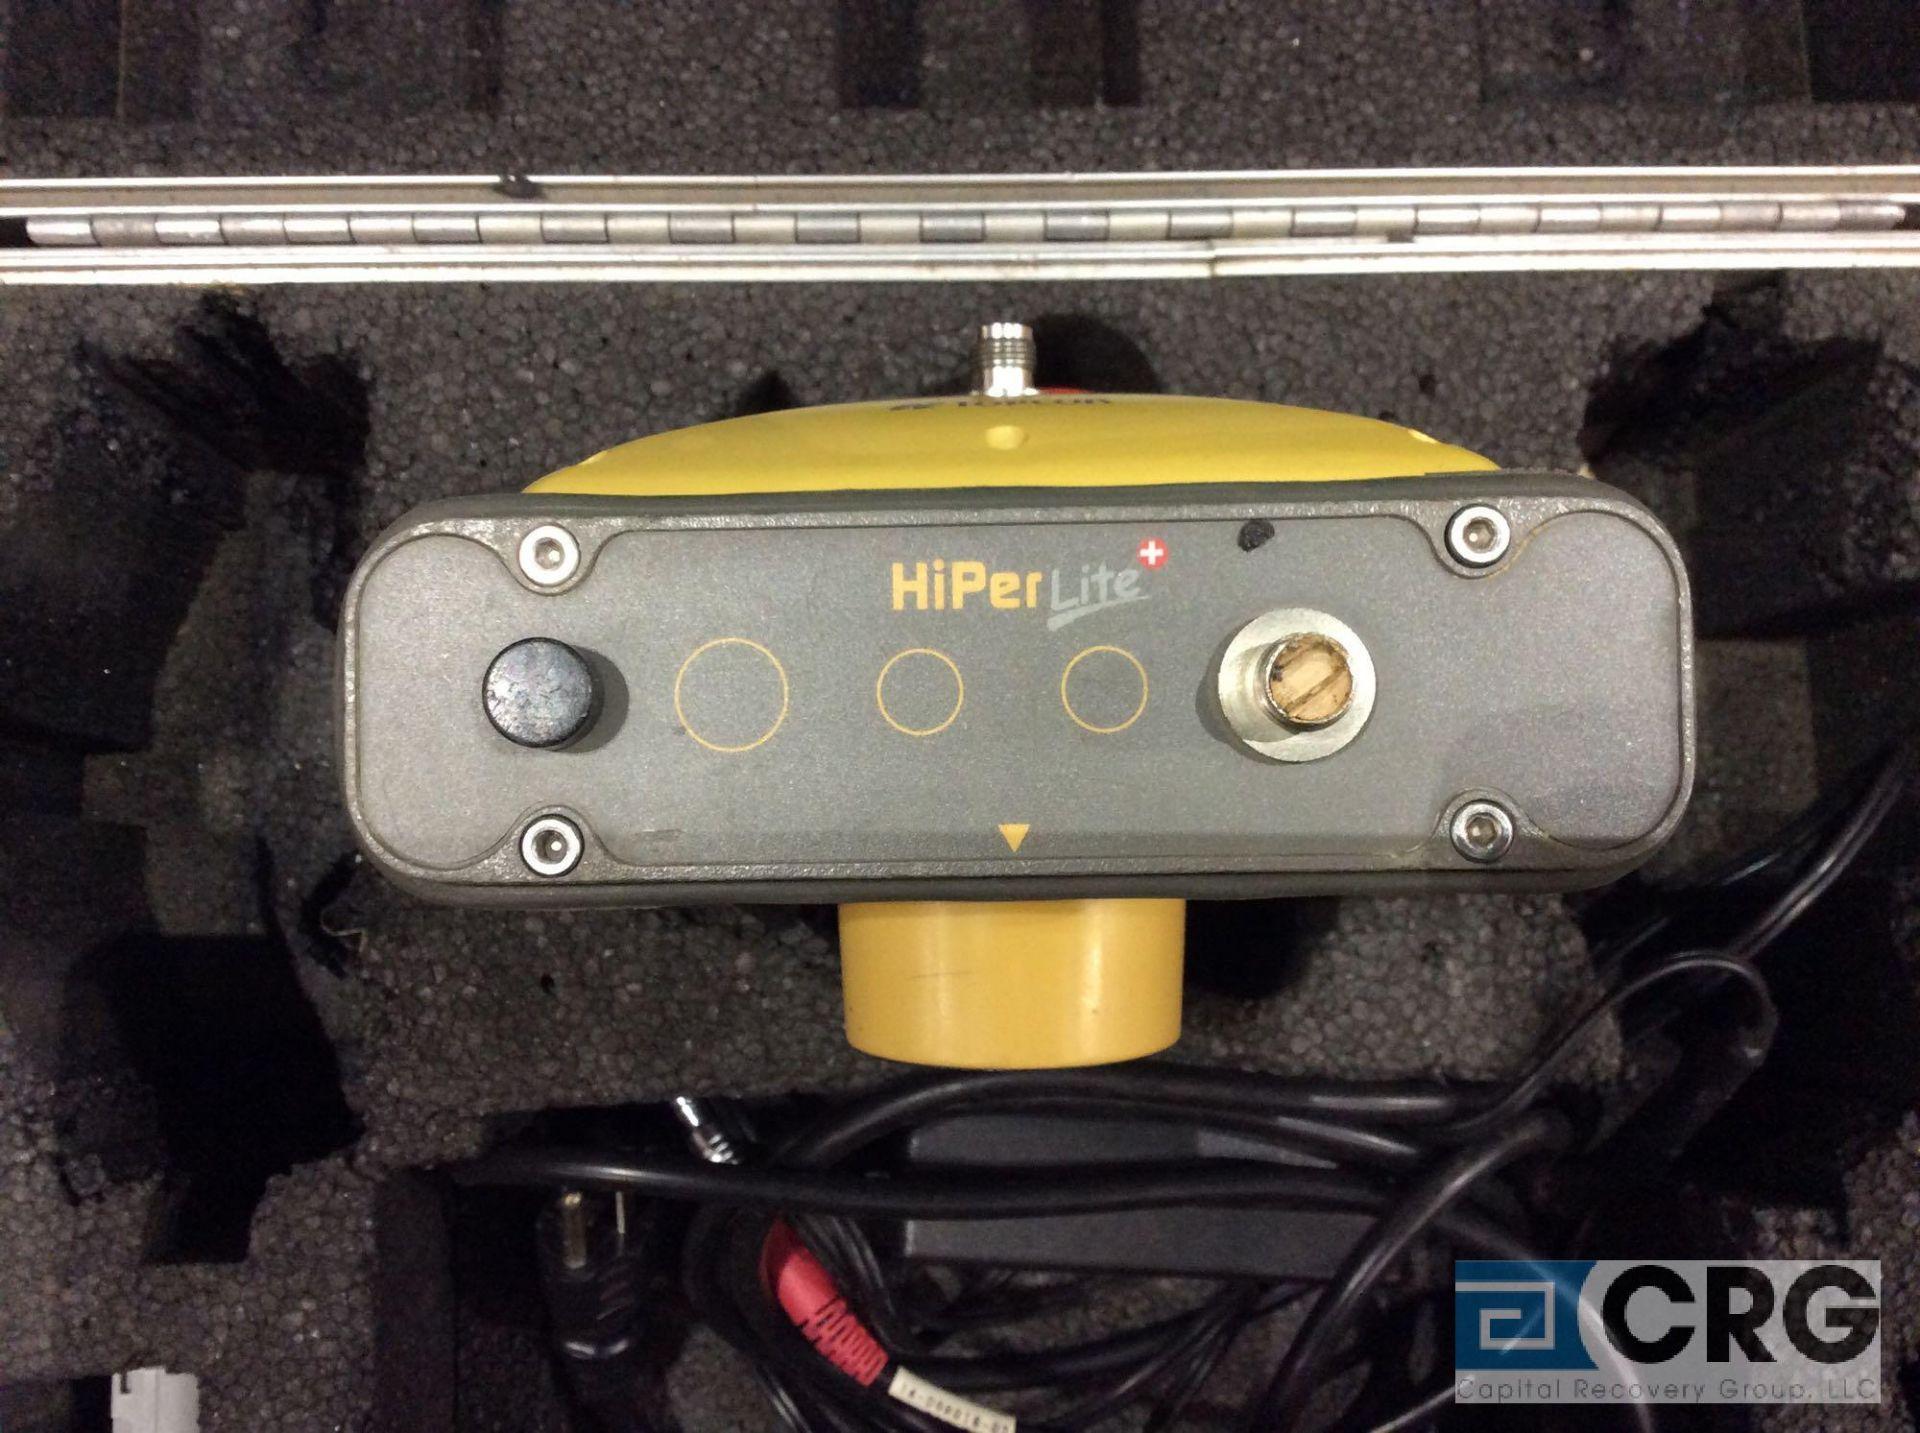 Lot 190 - Top Con GPS HIPER LITE 01-840802-07 Rover with case